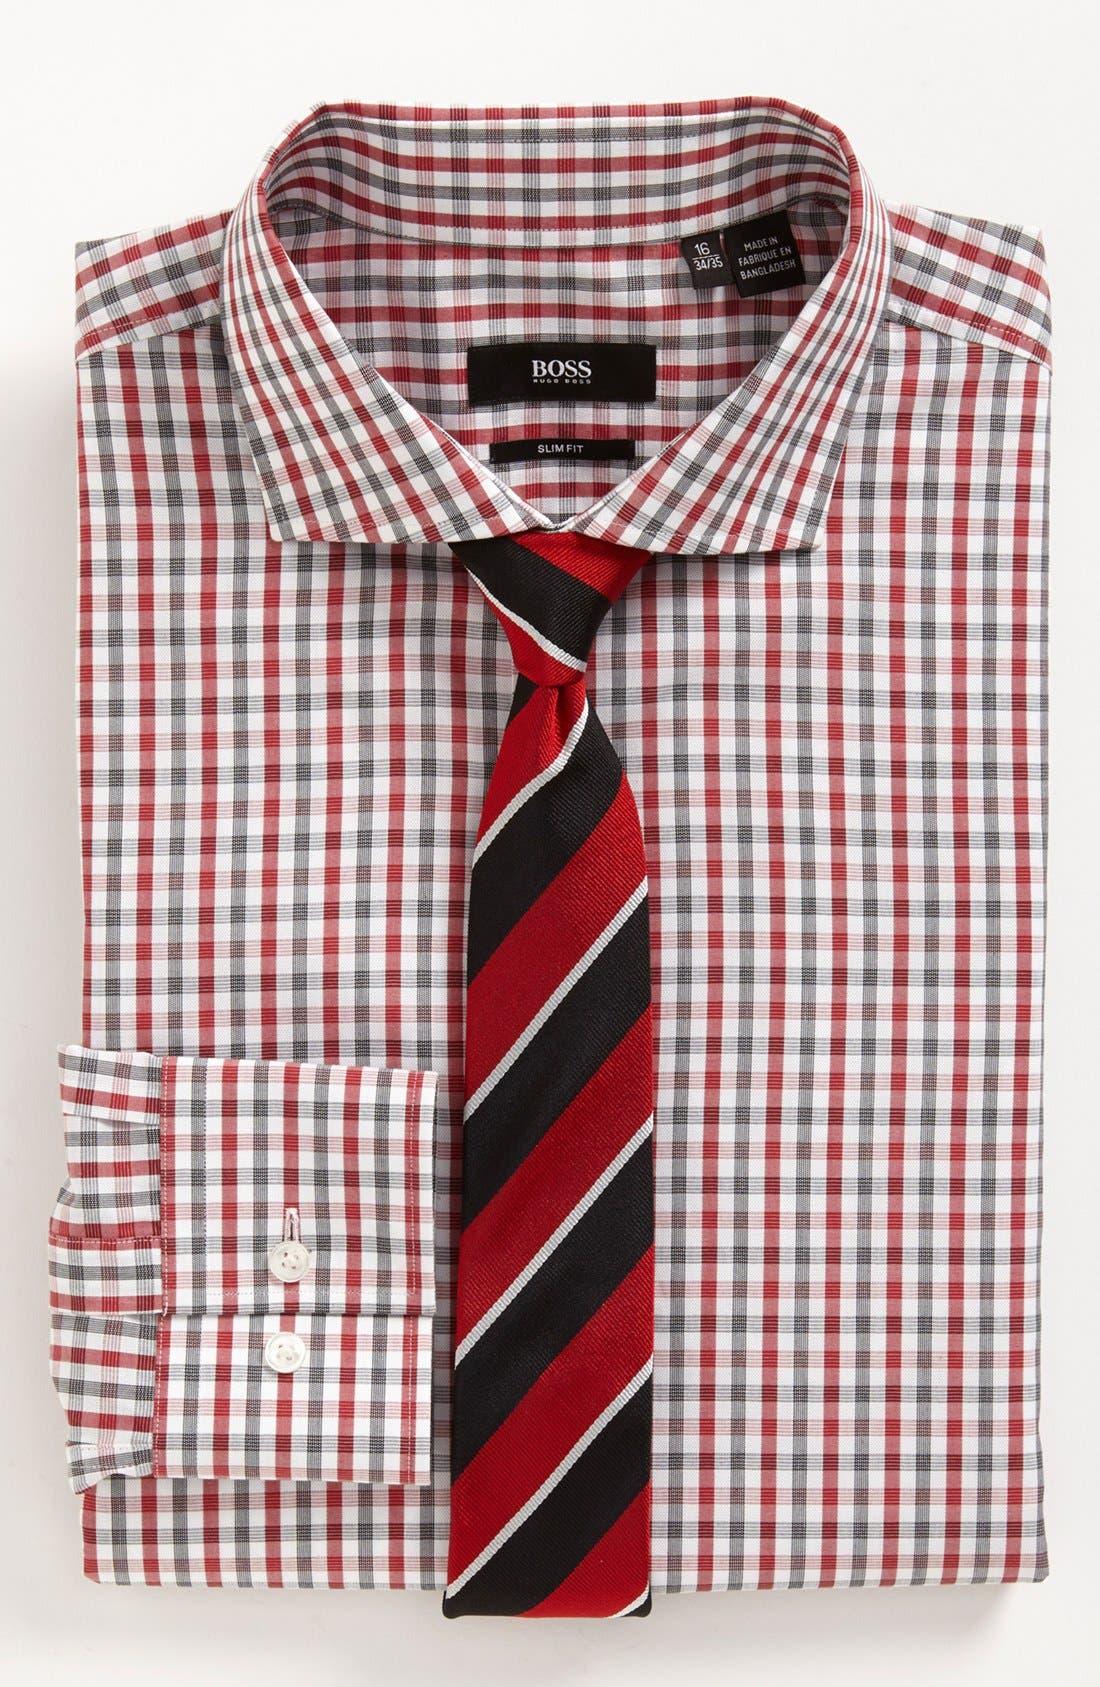 BOSS Black Dress Shirt & Tie,                         Main,                         color, Red